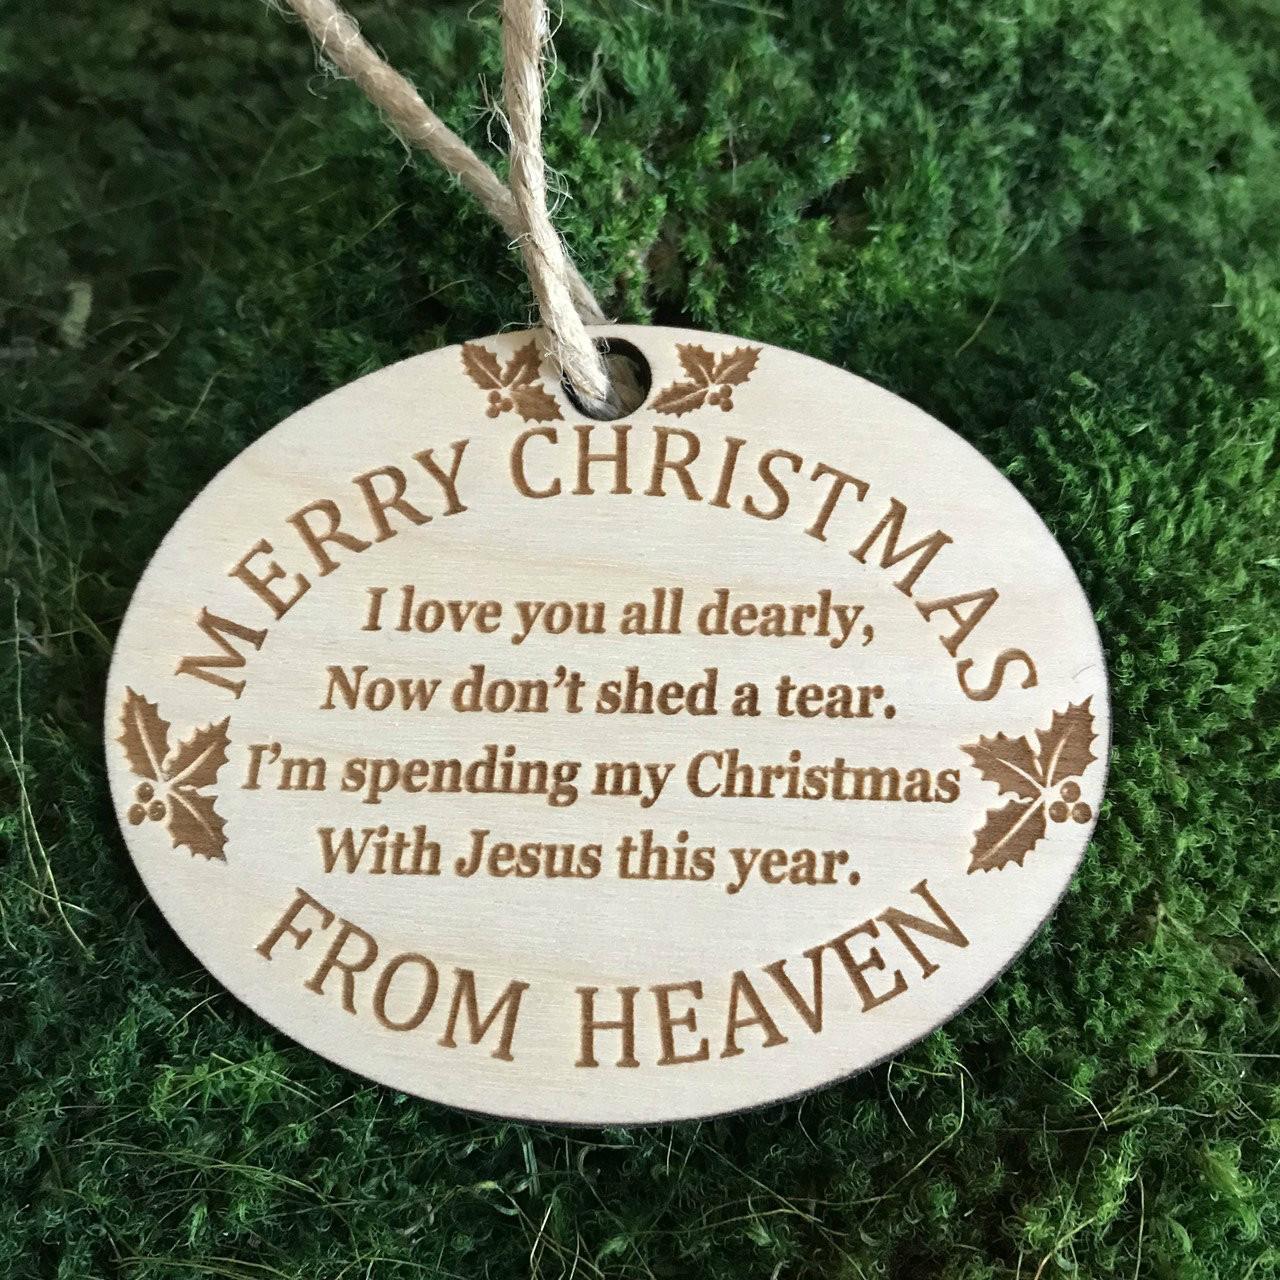 Christmas From Heaven.Christmas From Heaven With Holly Wood Ornament Christmas Christmas Ornament